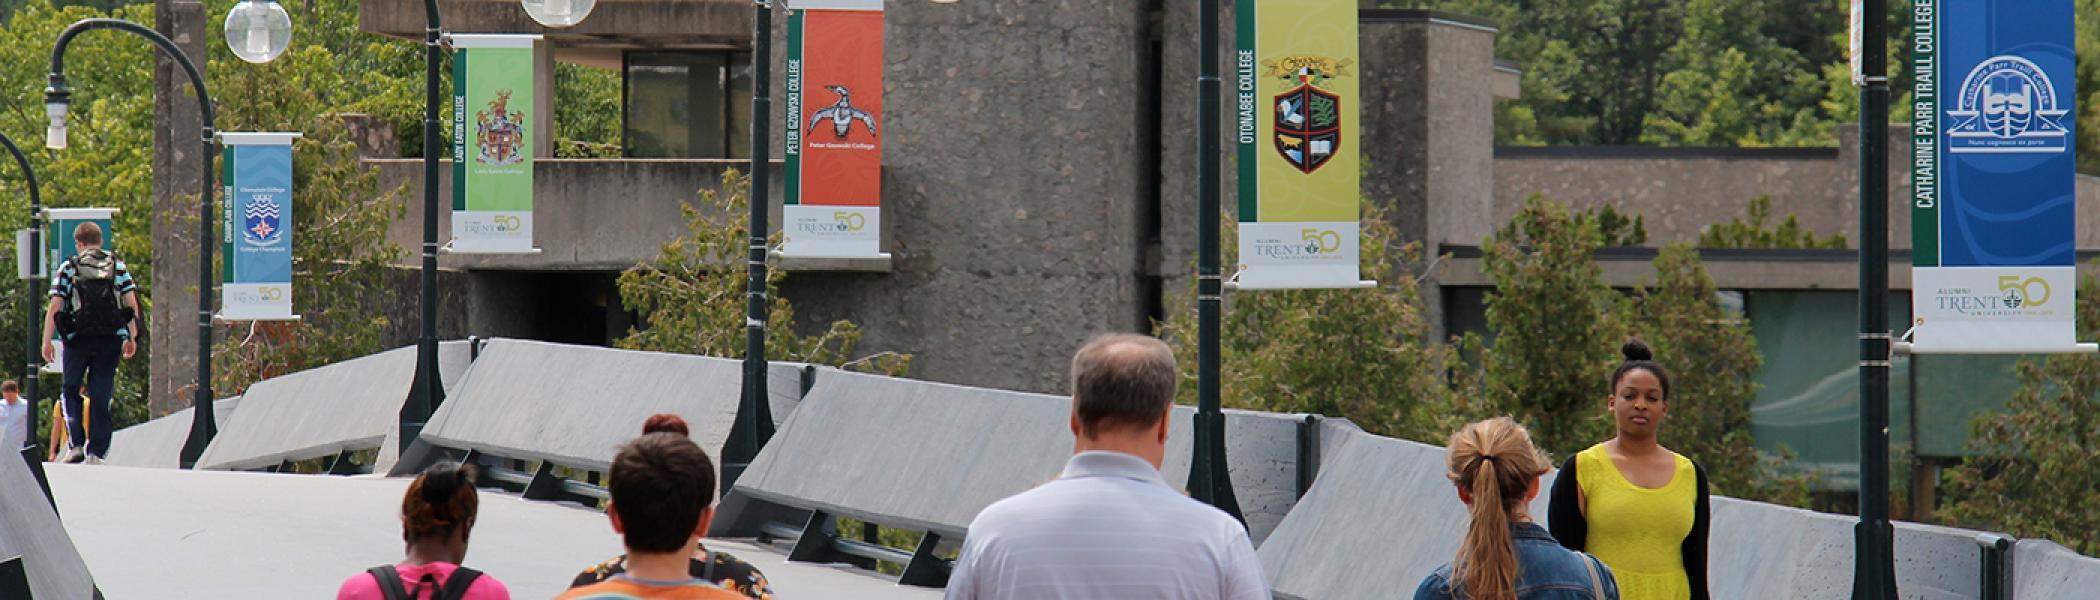 People walking across Faryon Bridge - flags of the colleges flying on bridge